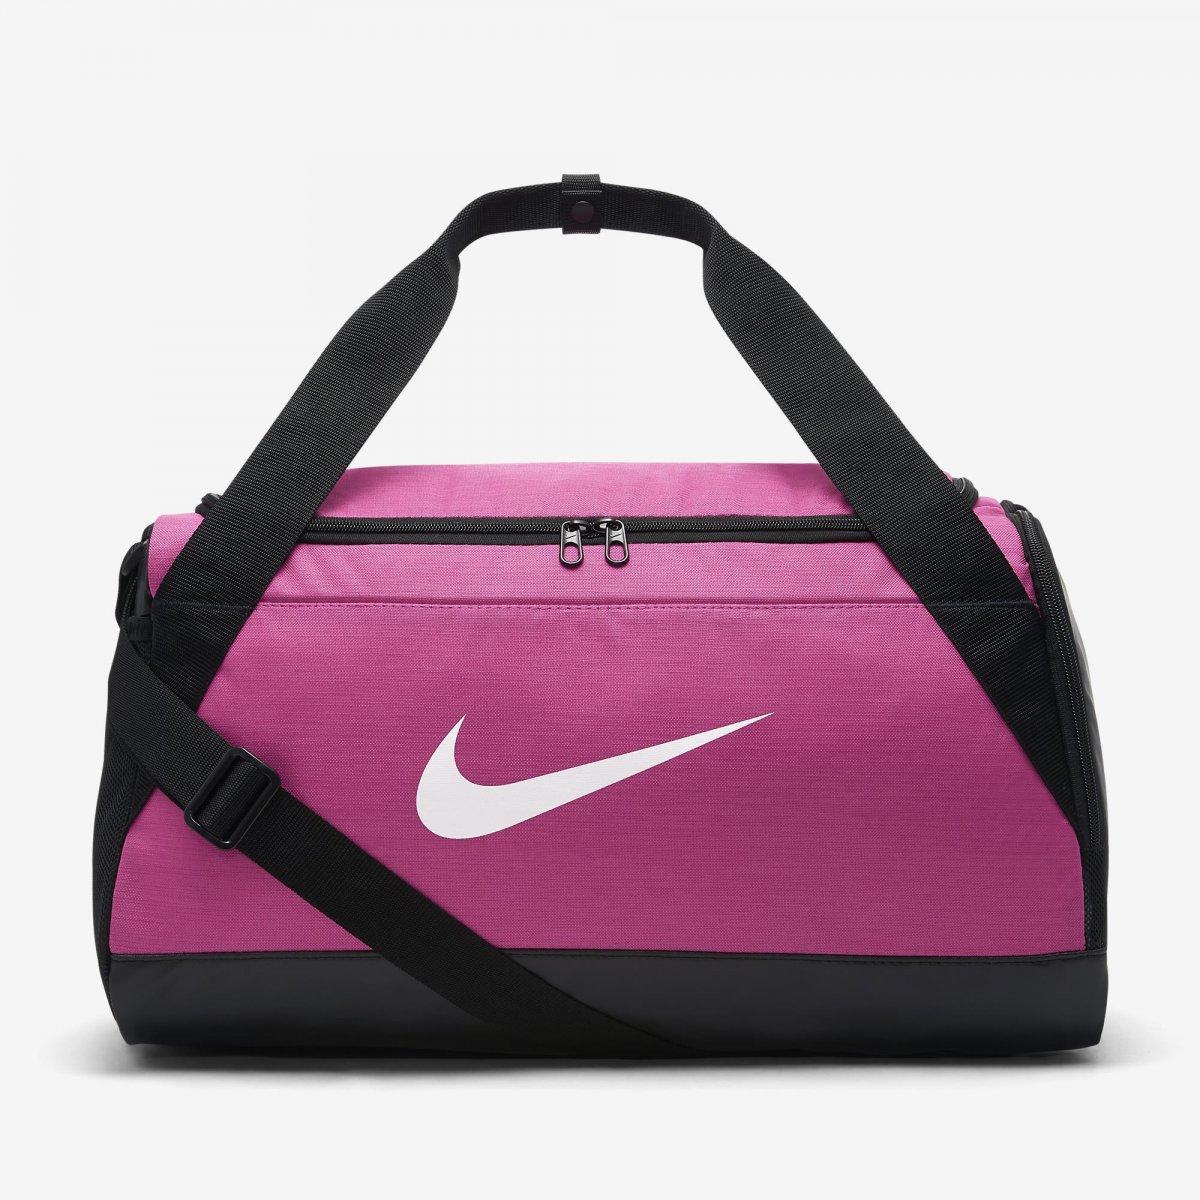 5292778a5 Bolsa Esportiva Nike Brasilia Duffel Small